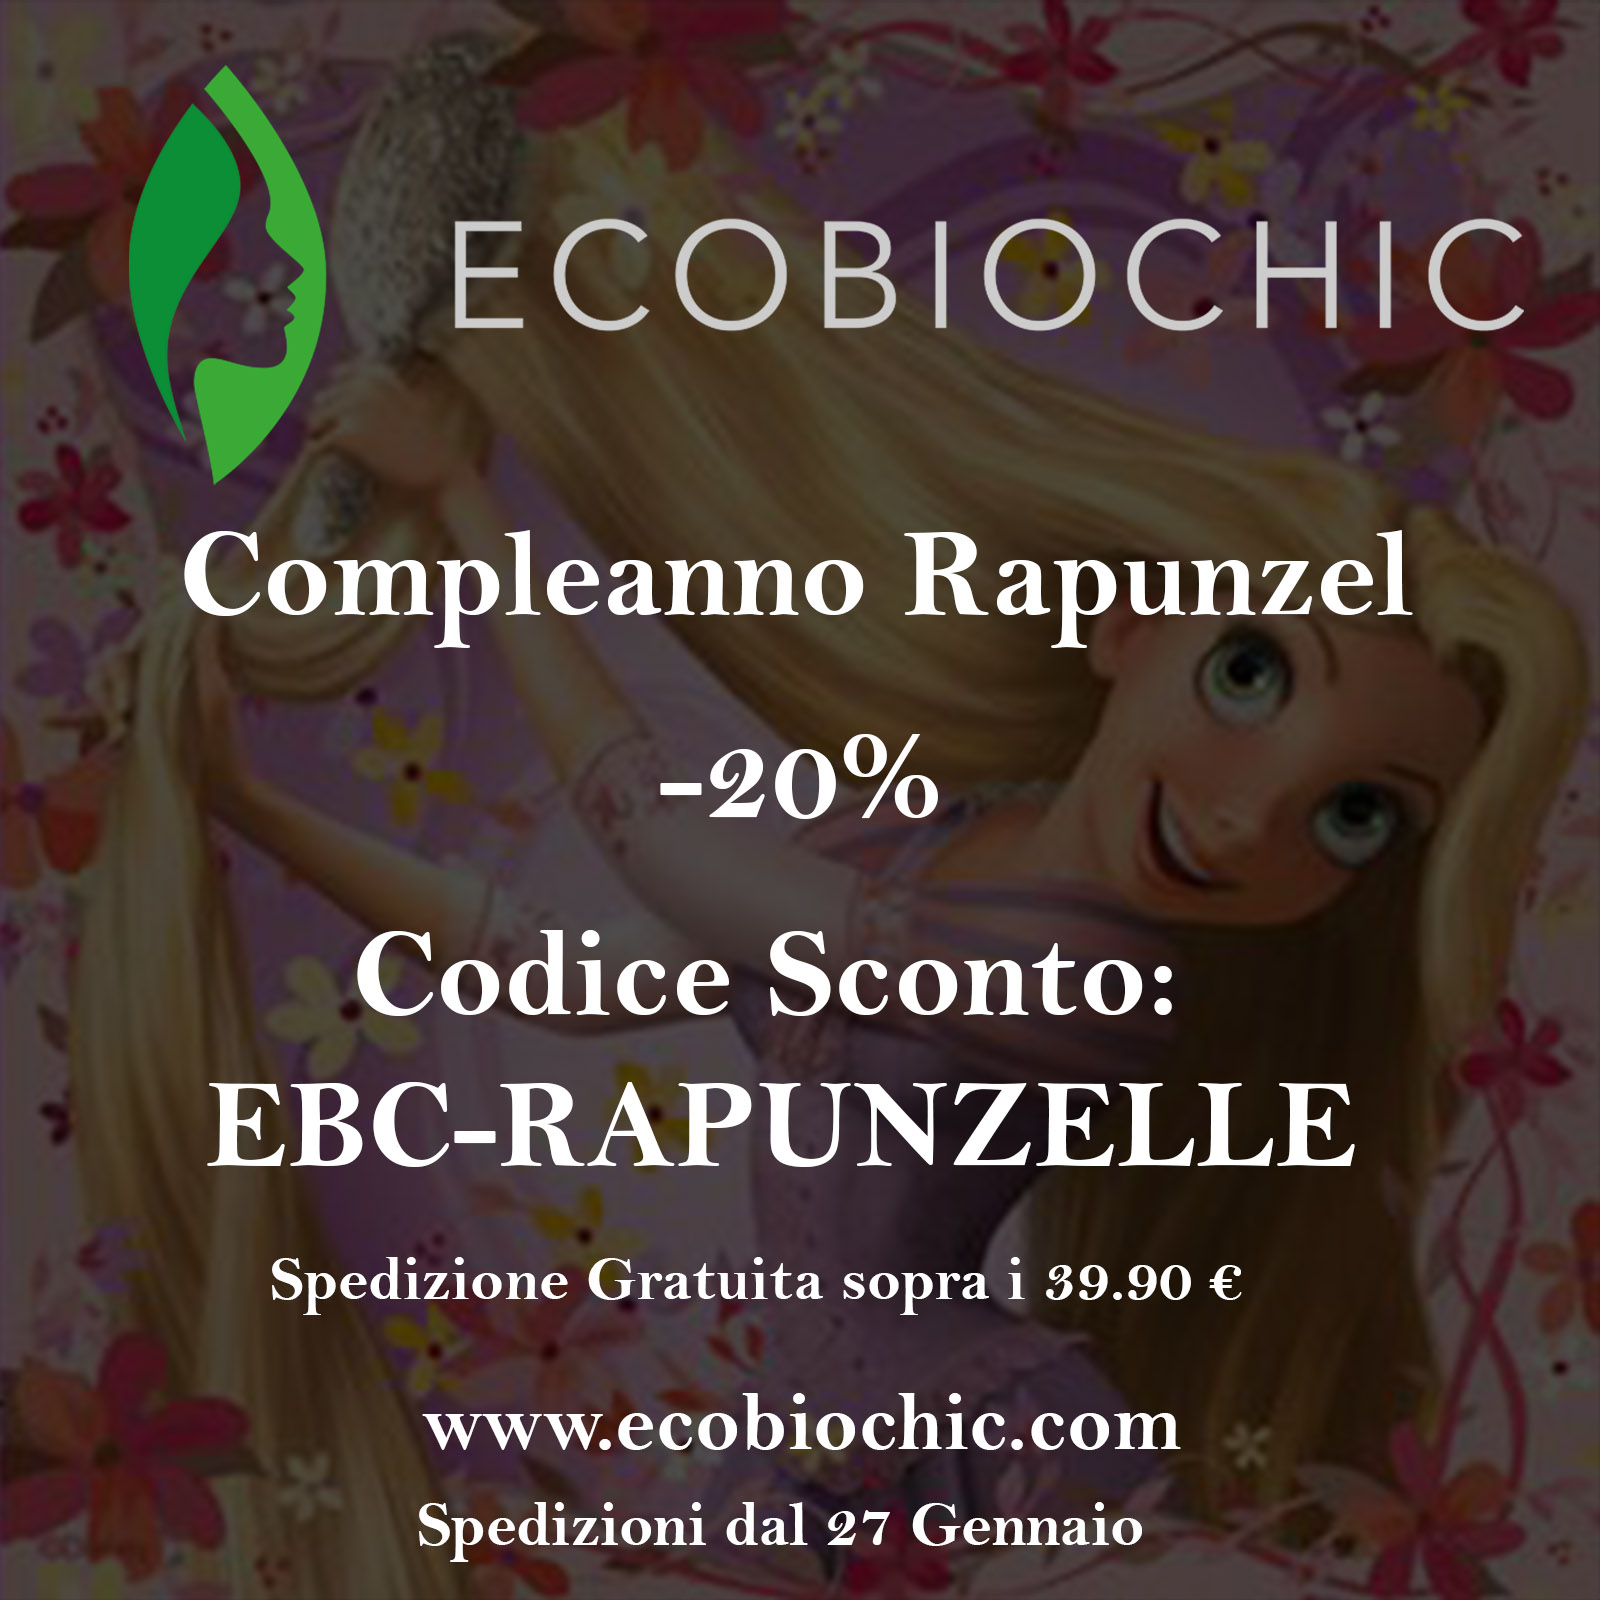 EcobioChic Compleanno Rapunzel